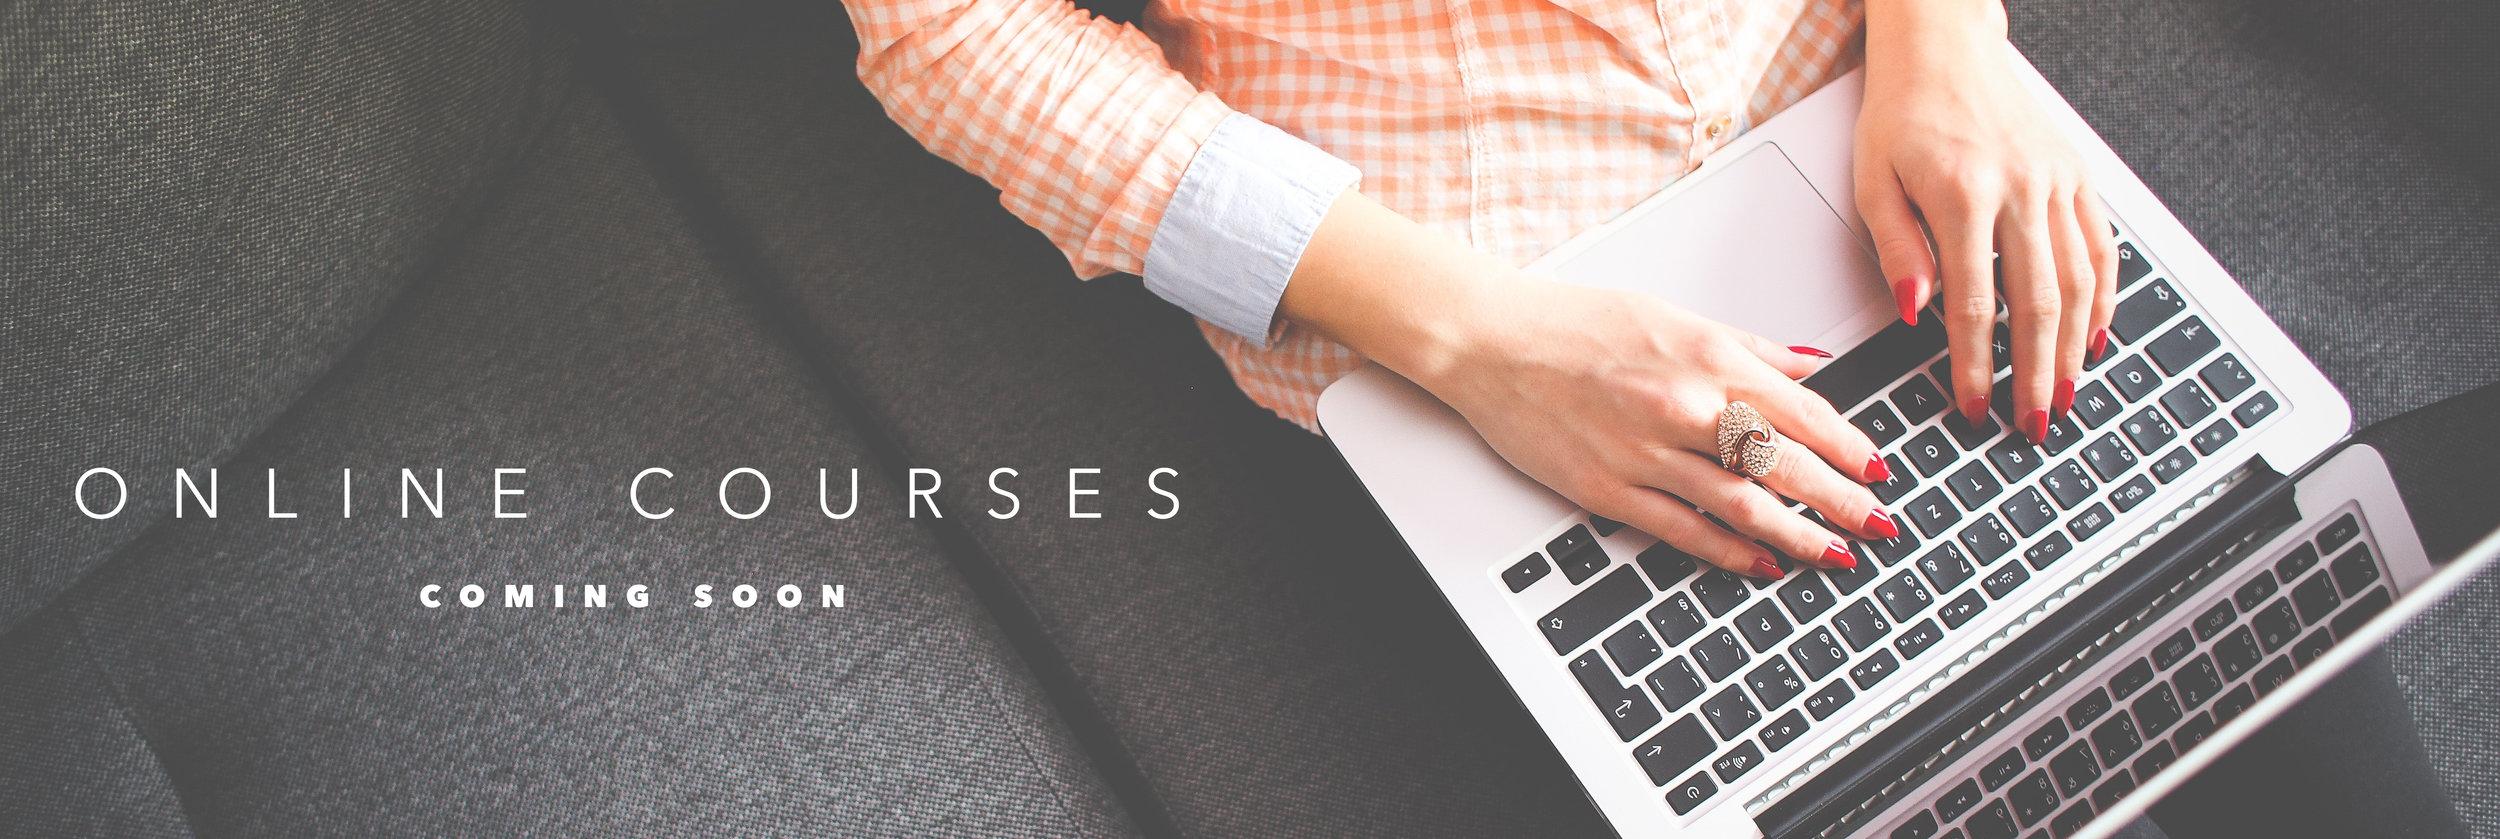 Pentagon Studio - Website Courses Online - Squarespace - Greater Lowell - Graphic Designer